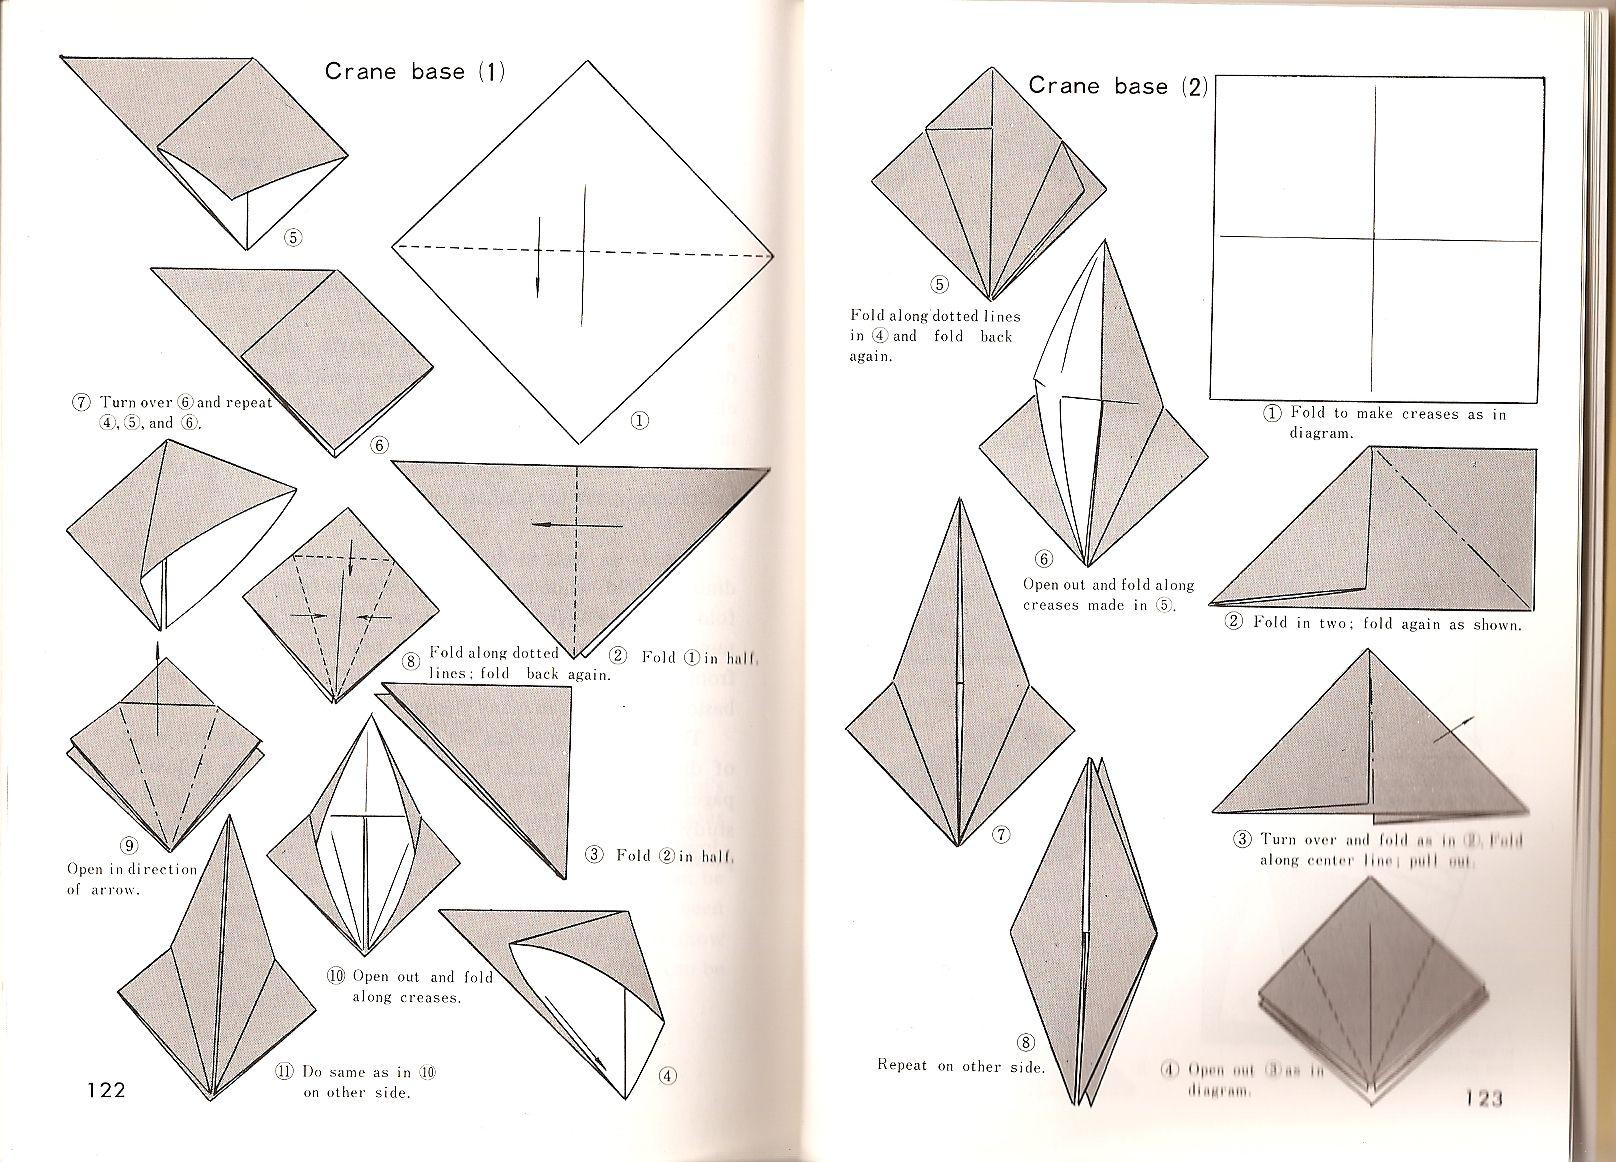 Origami crane making instructions google search 1000 e wash origami crane making instructions google search jeuxipadfo Choice Image